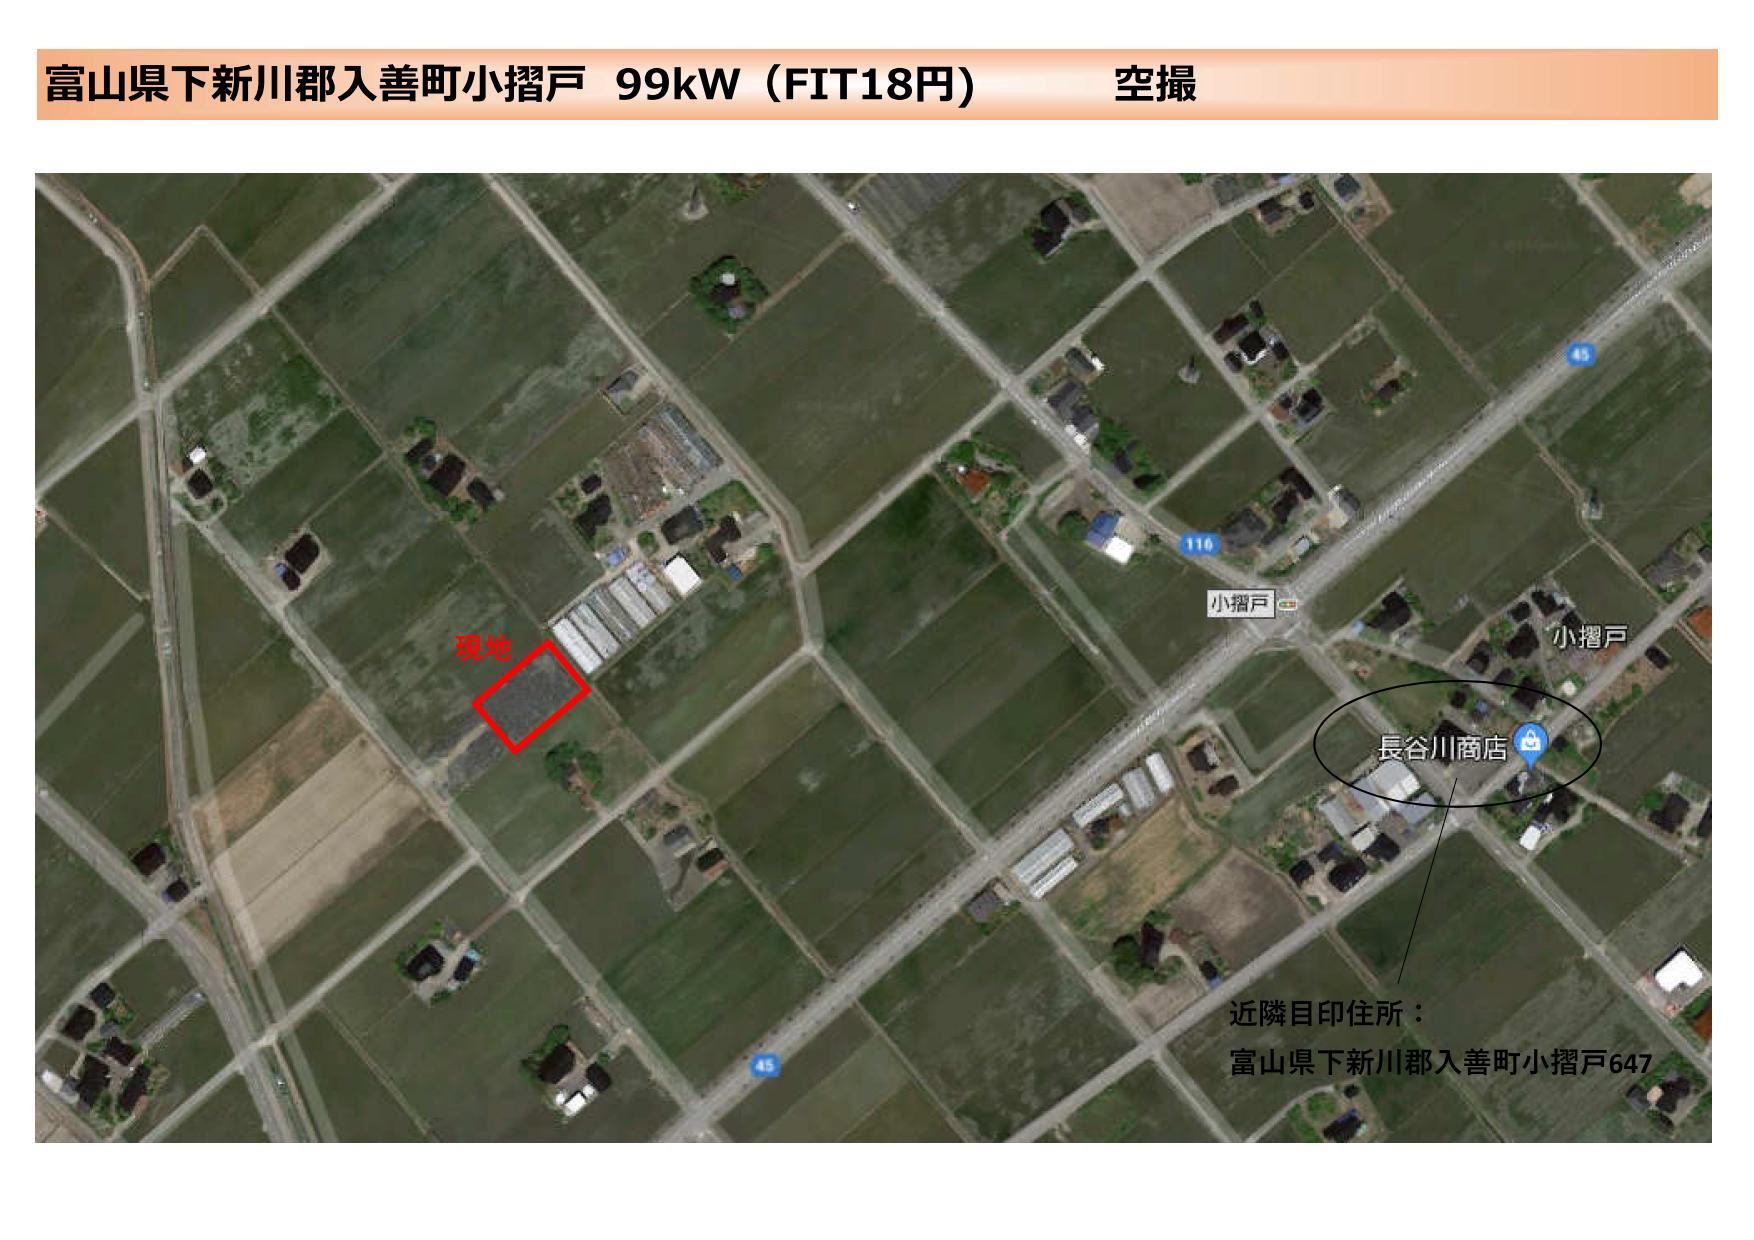 【SB】FIT18円 富山県下新川郡入善町小摺戸発電所のメイン画像